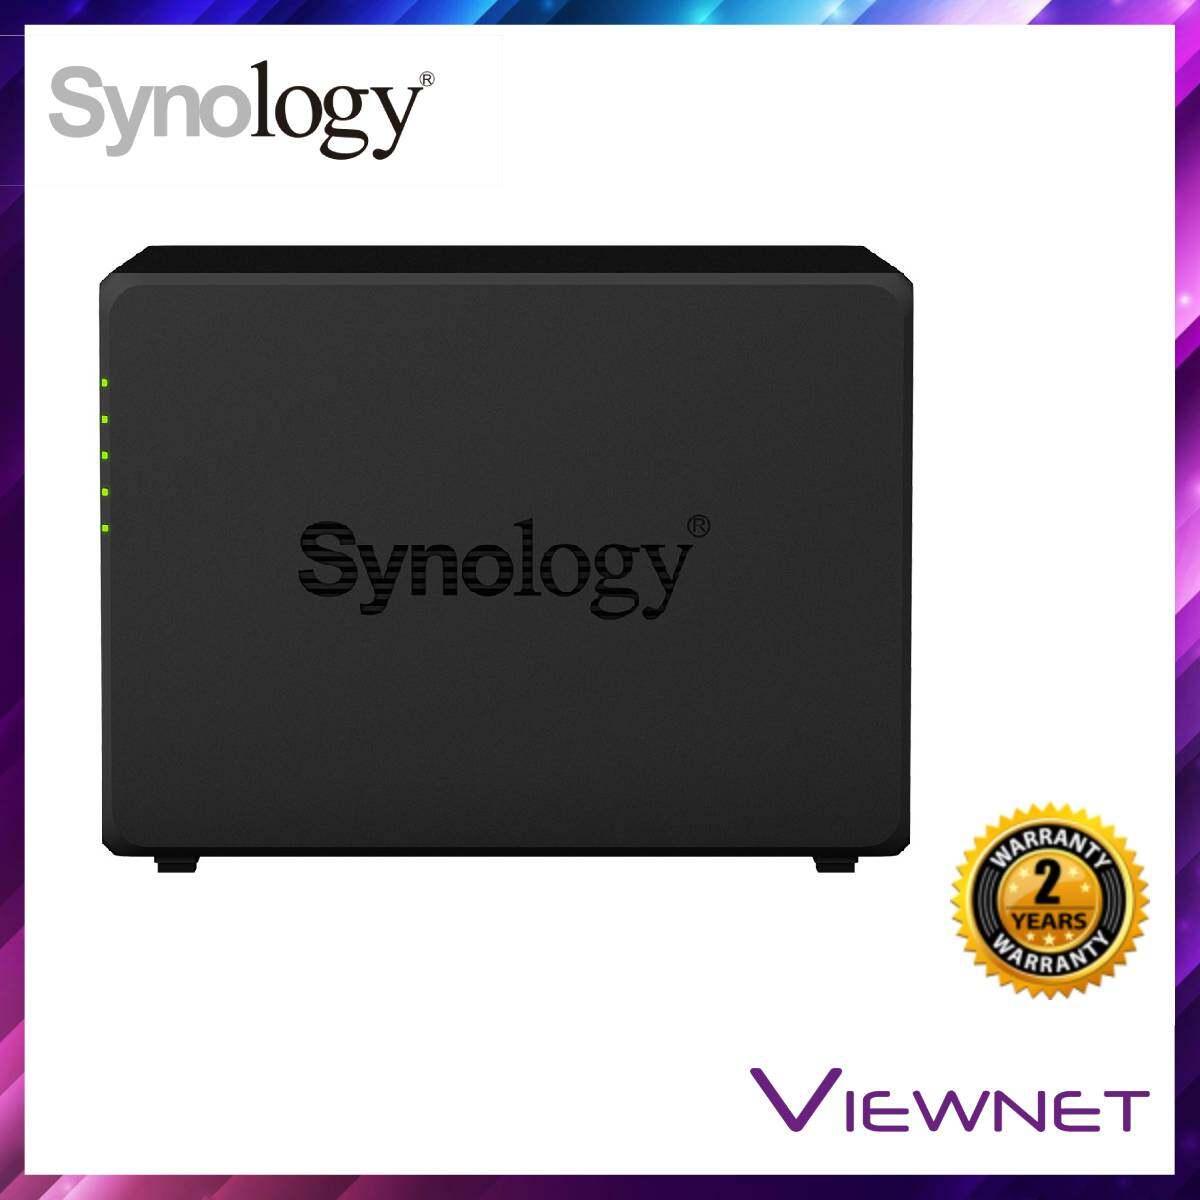 Synology Enclosure 4-BAYS/REALTEK RTD1296 QC 1.4GHz/2GB (DS418) NAS